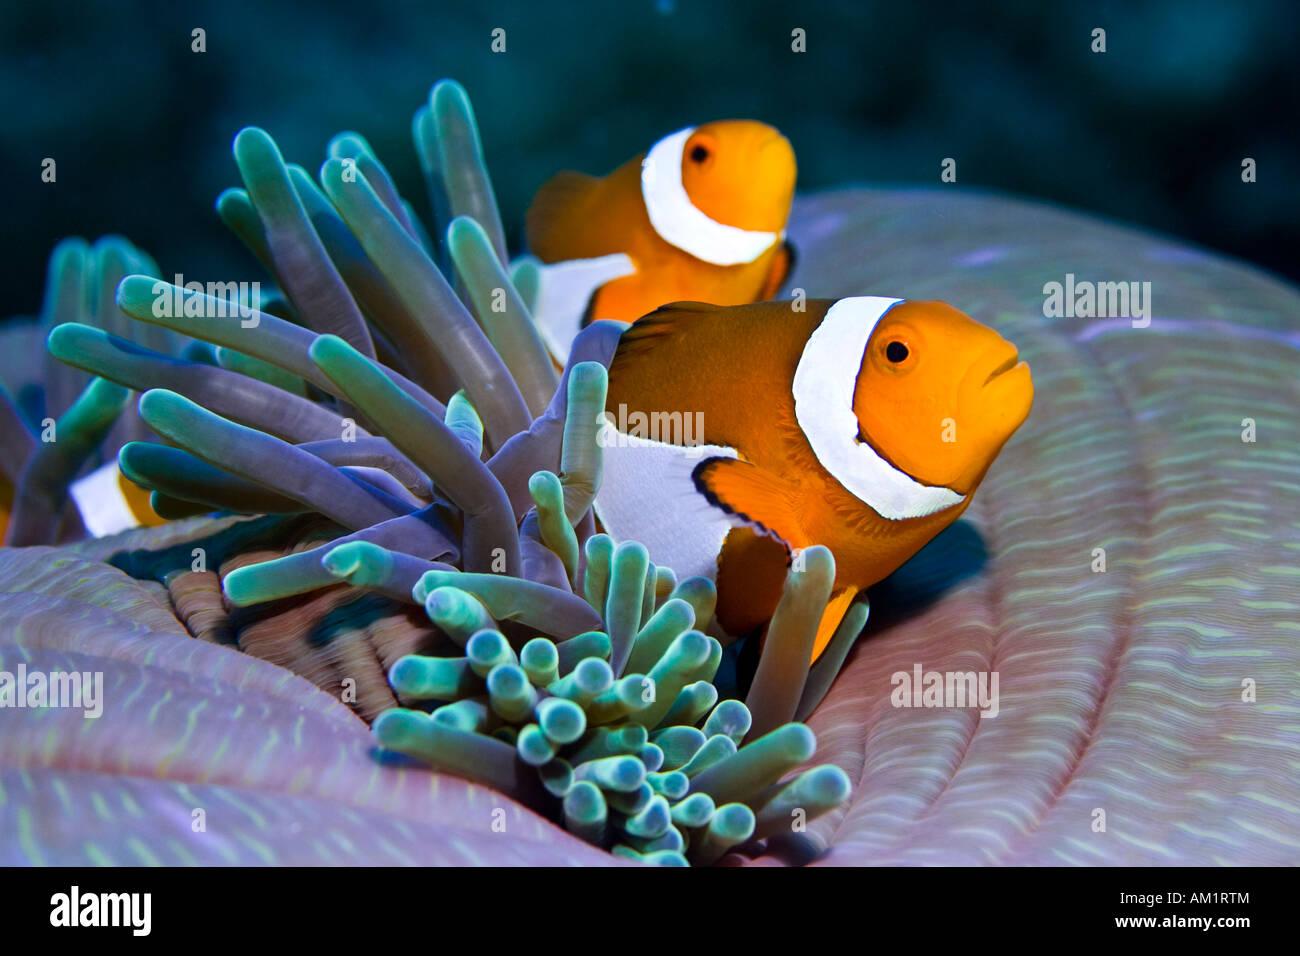 False anemonefish or Clownfish Amphiprion ocellaris. - Stock Image